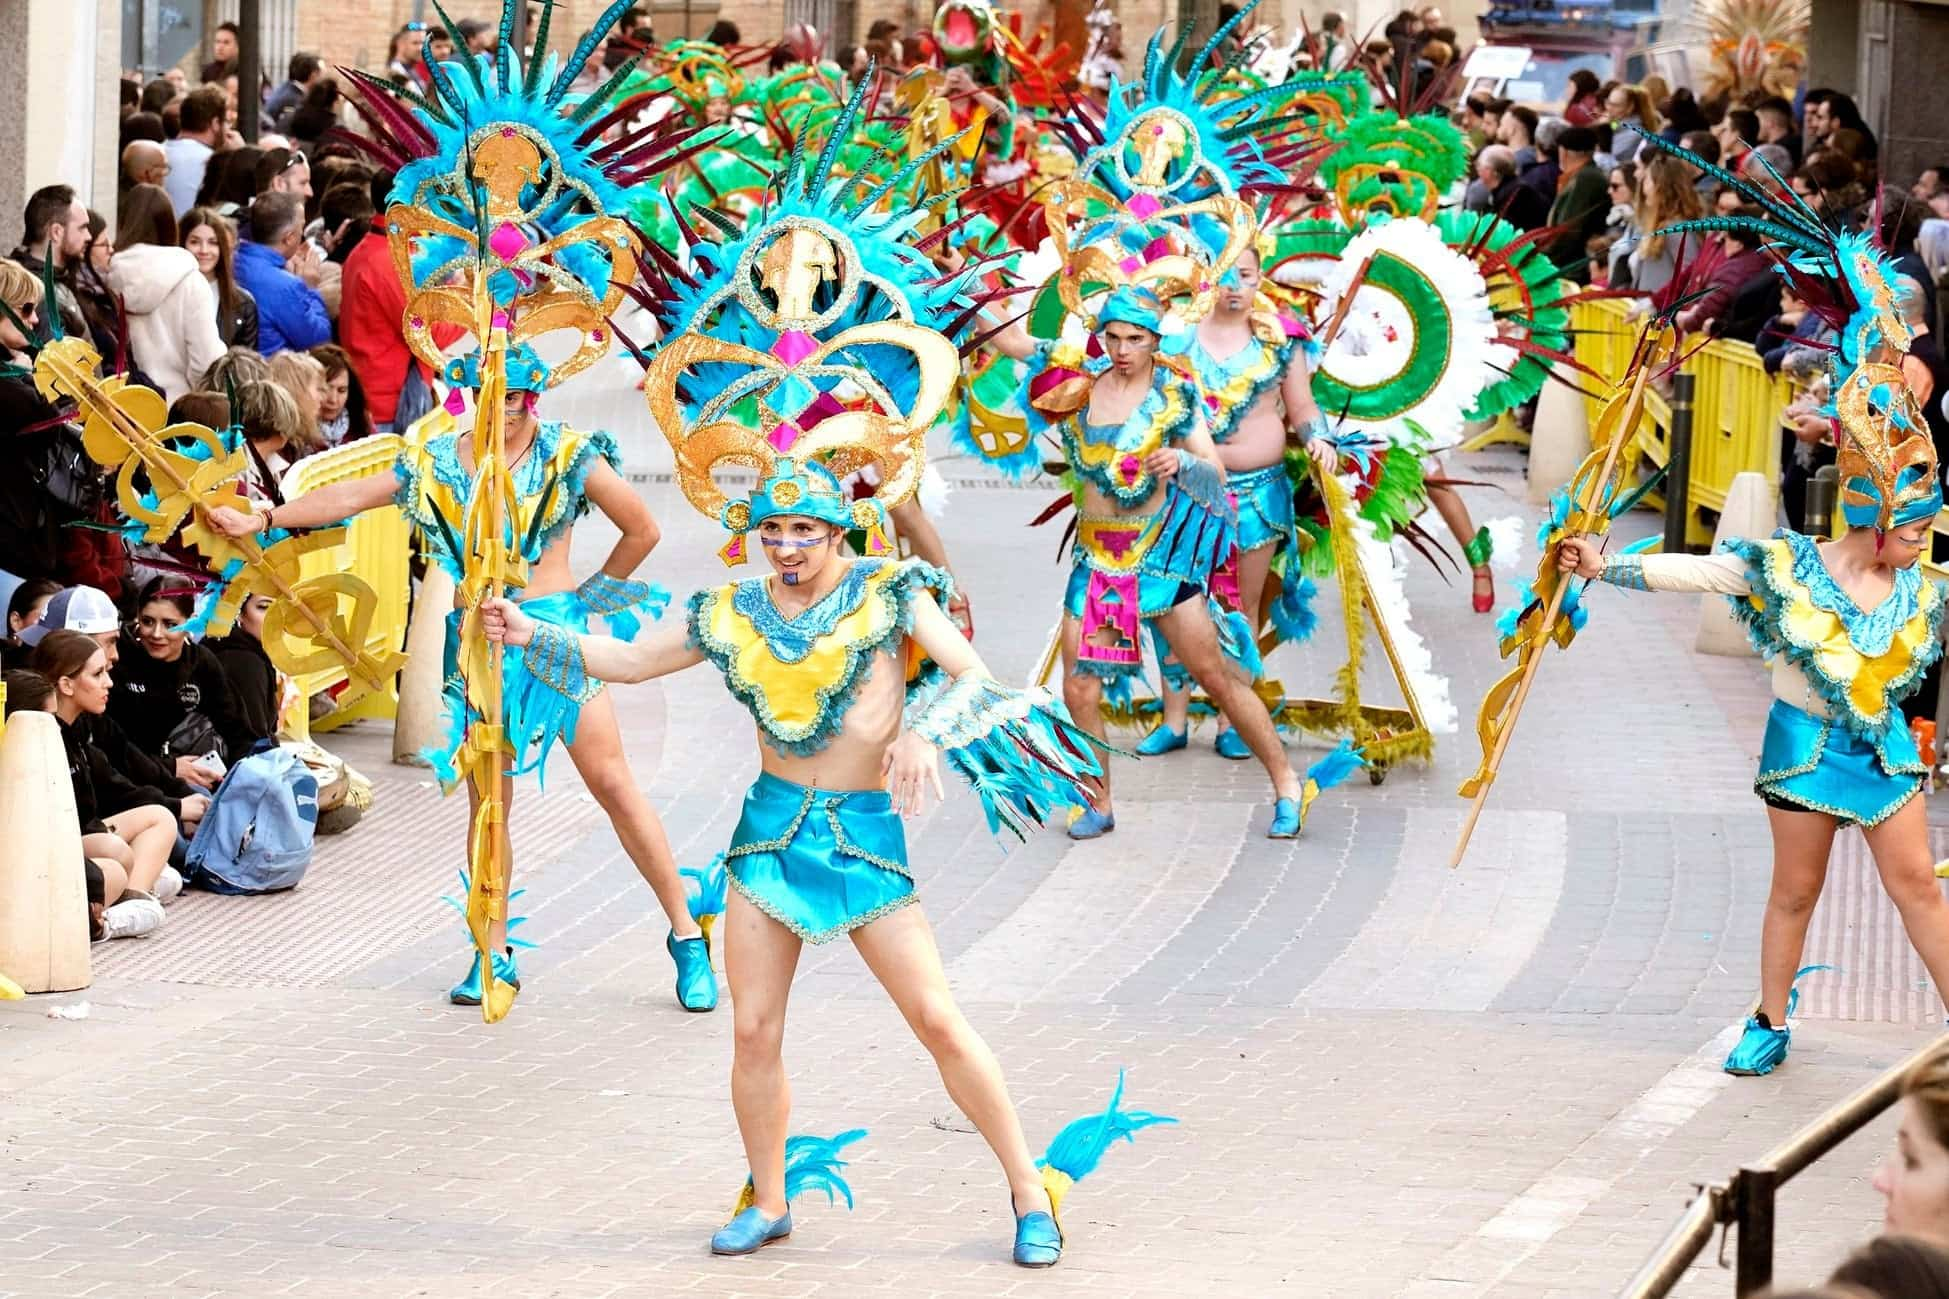 Carnaval de herencia 2020 ofertorio 154 - Selección de fotografías del Ofertorio del Carnaval de Herencia